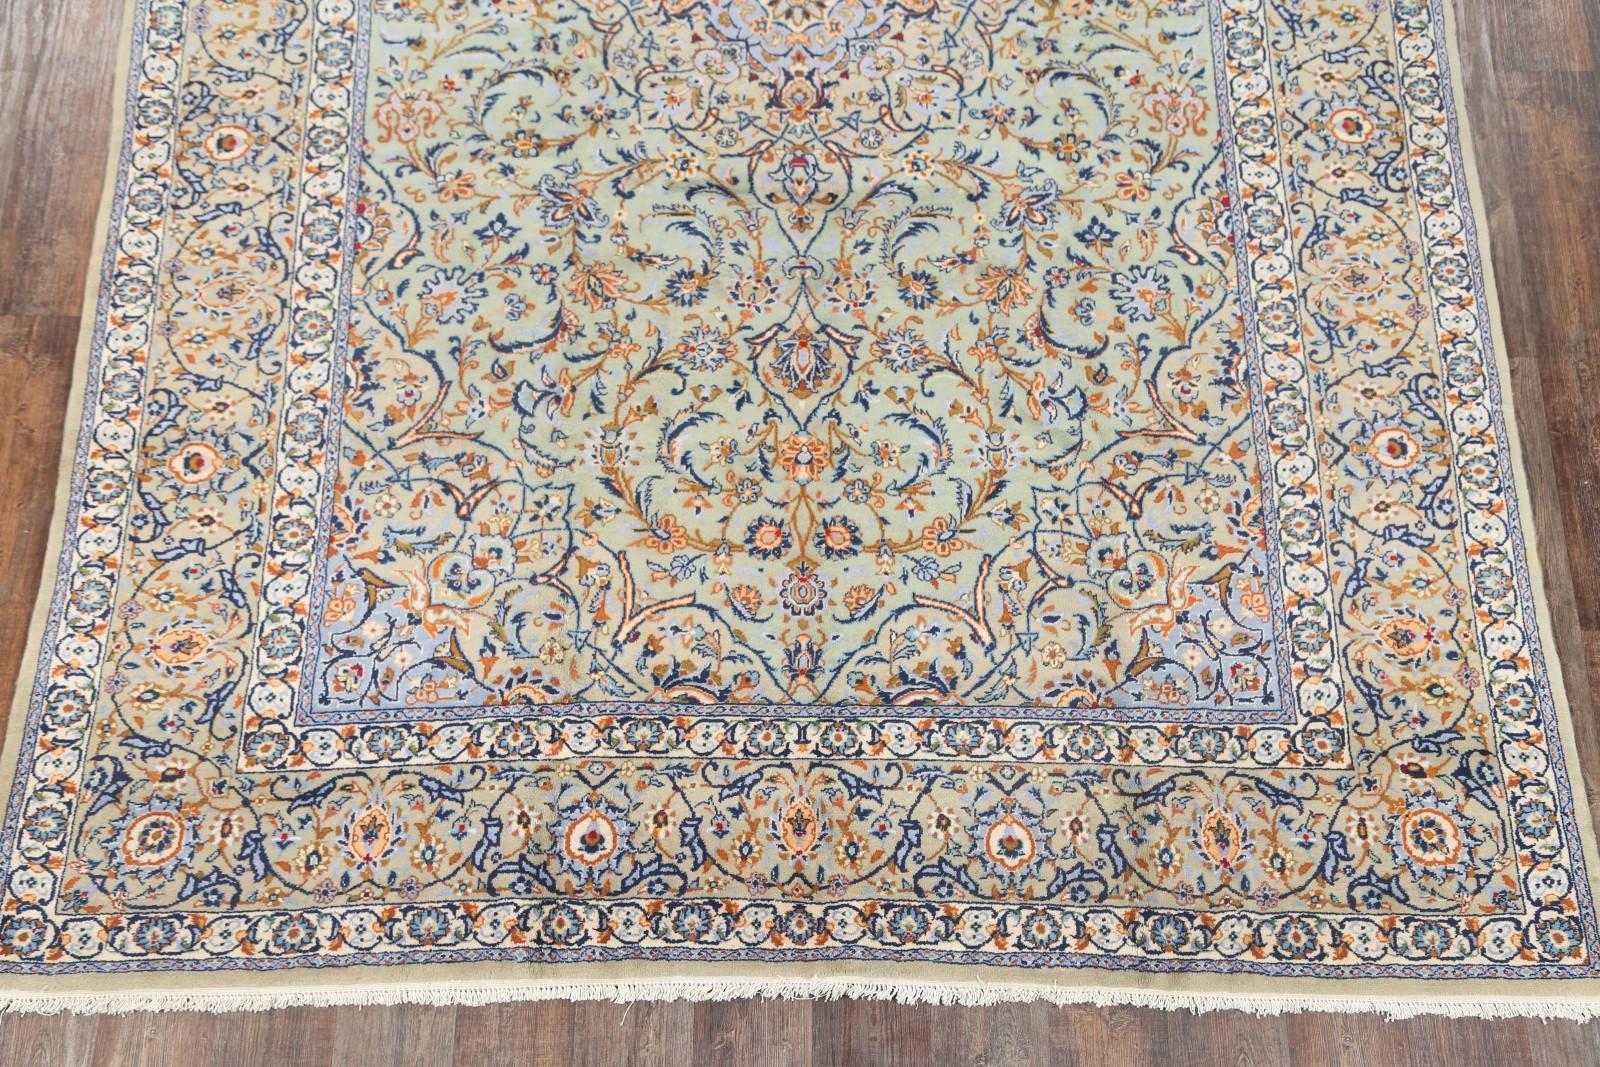 excellent hand knotted floral sage green 9x13 kashan persian oriental area rug ebay. Black Bedroom Furniture Sets. Home Design Ideas